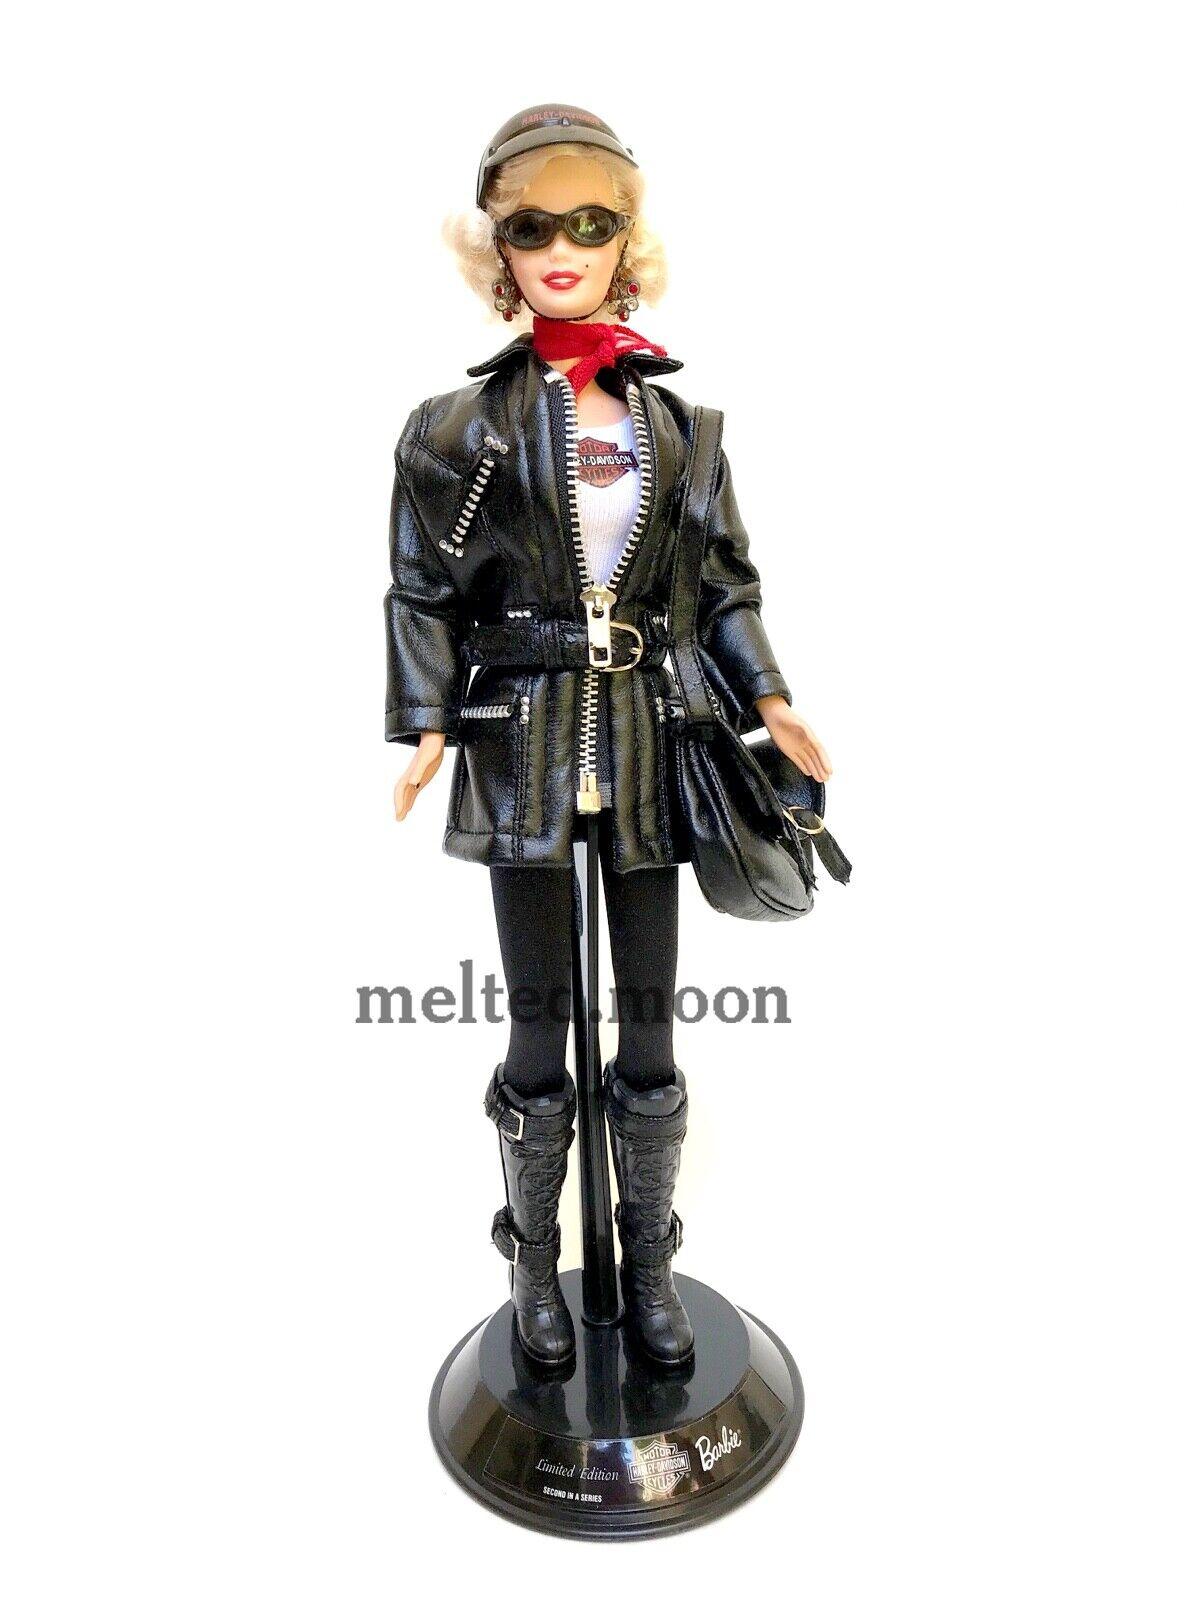 Marilyn Monroe Barbie Doll as Harley Davidson Biker OOAK Celebrity rotress Loose